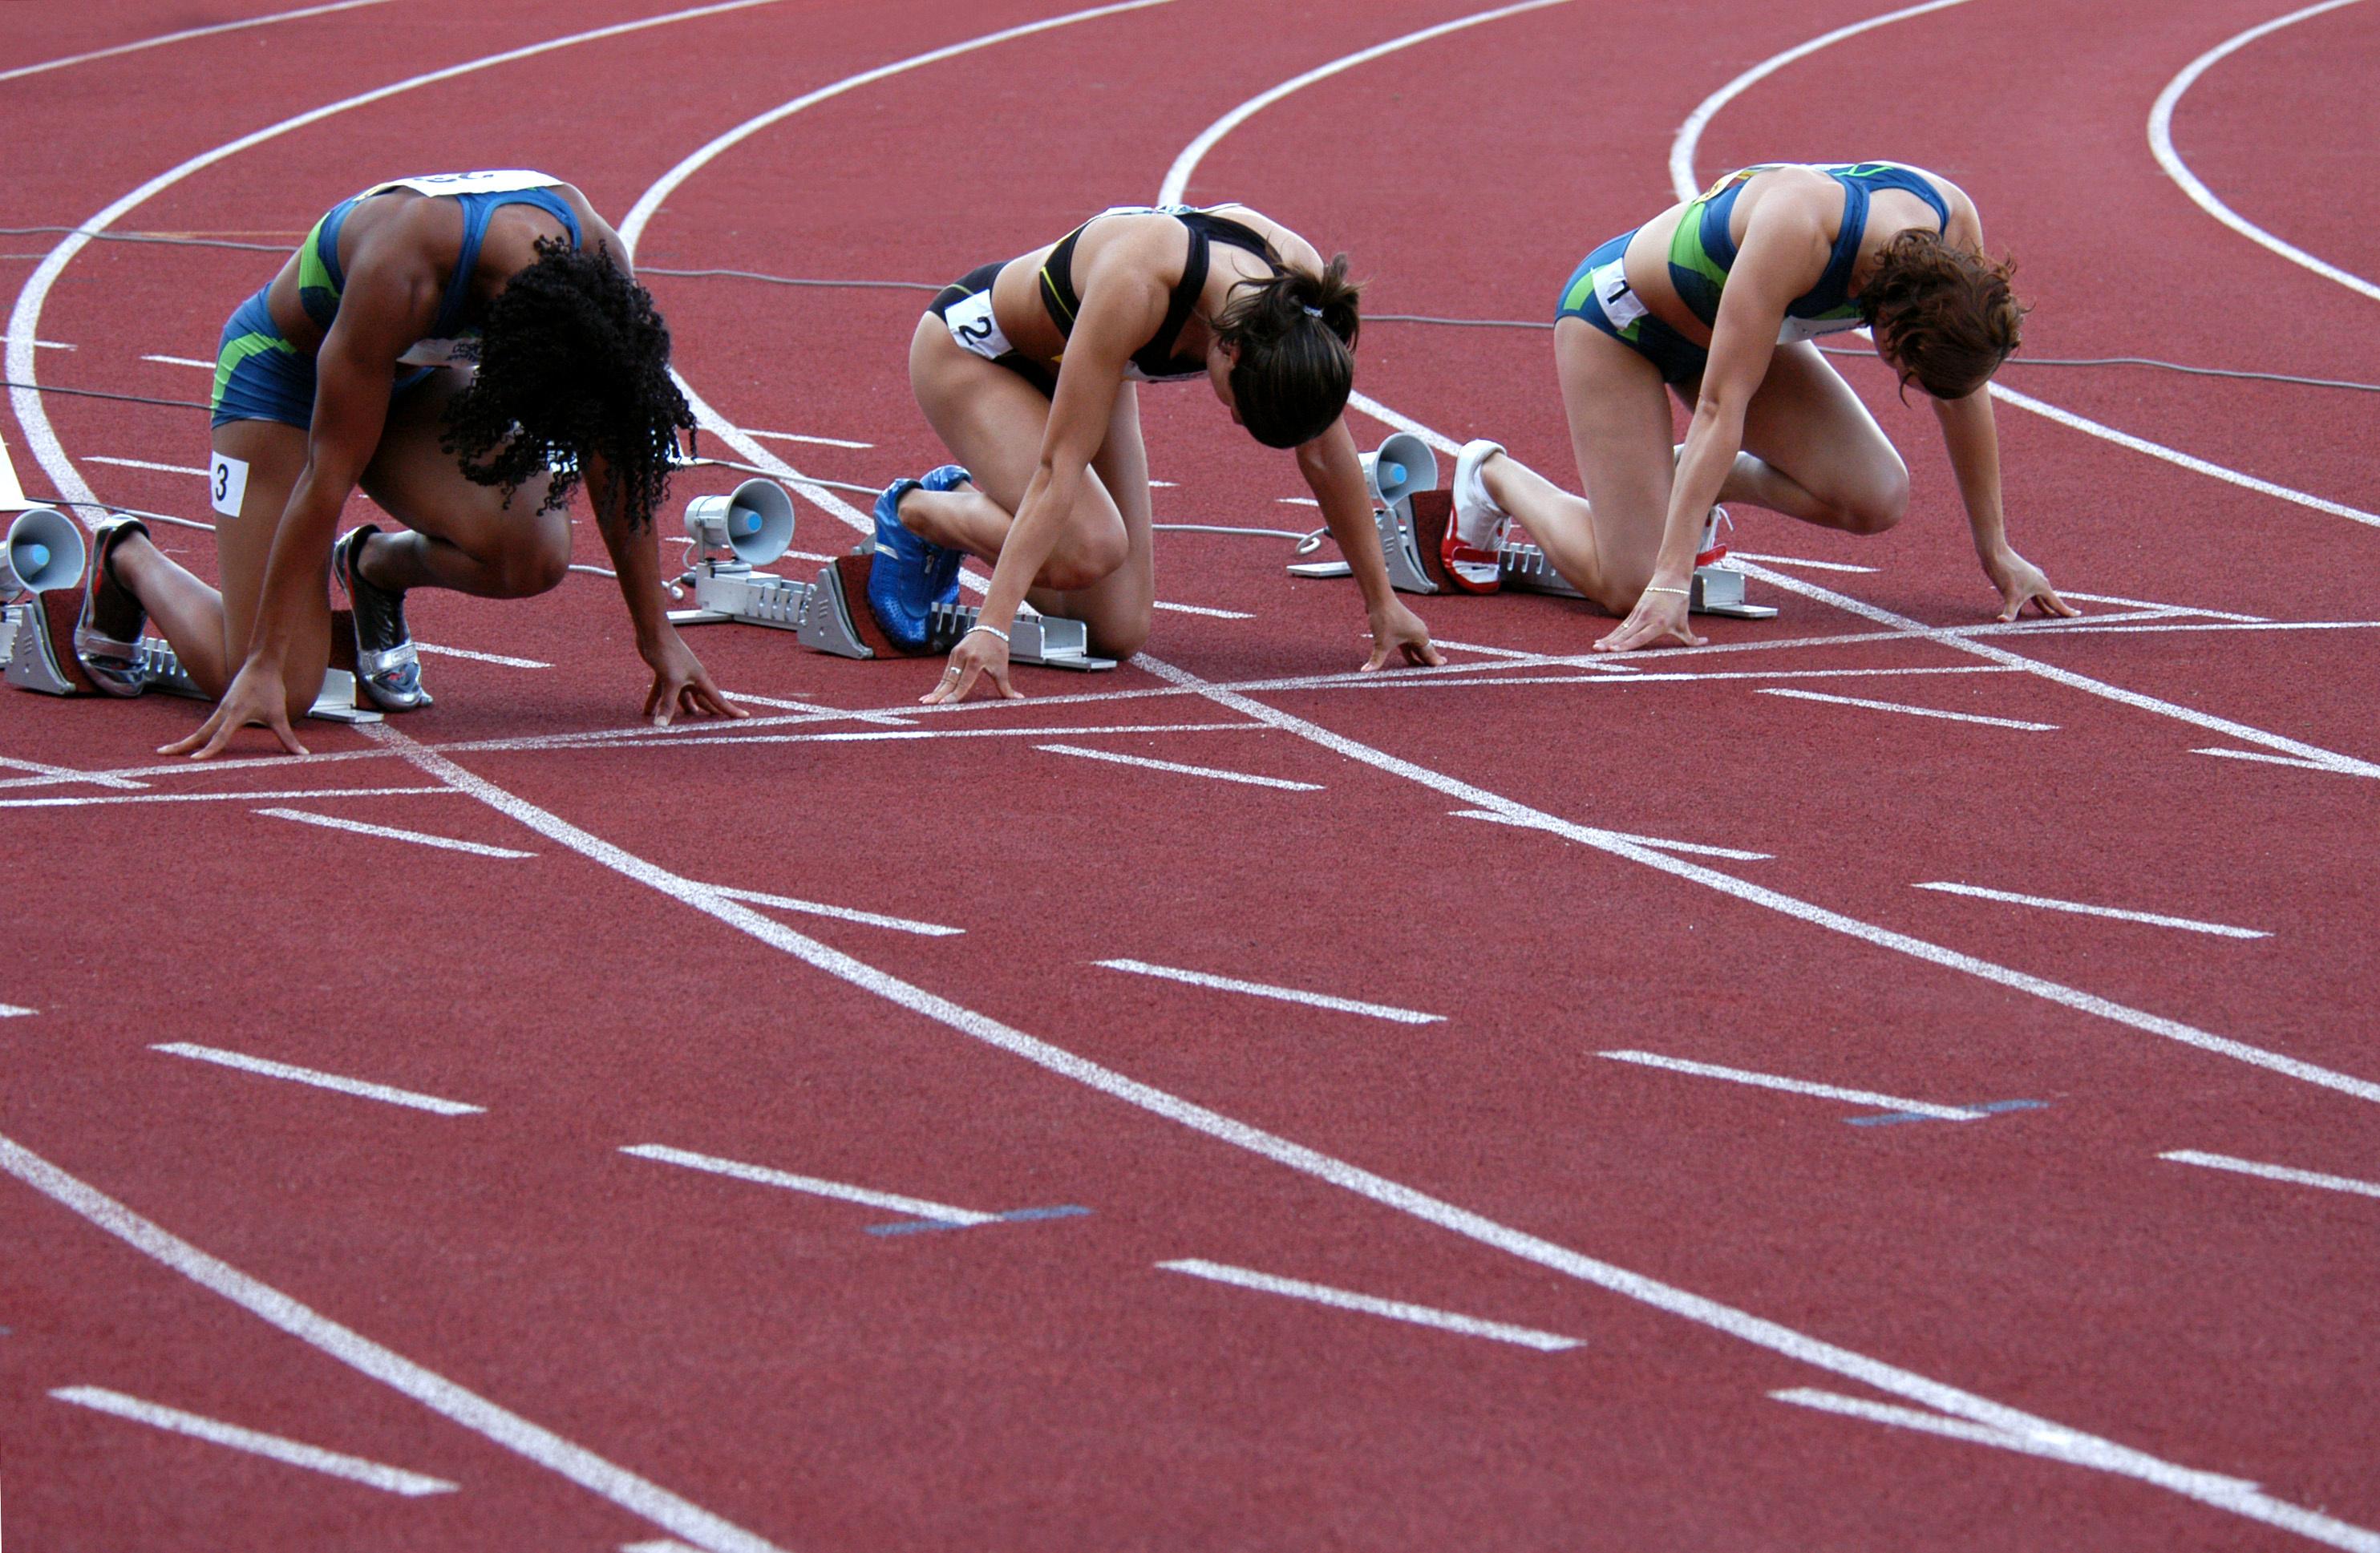 préparation sportive